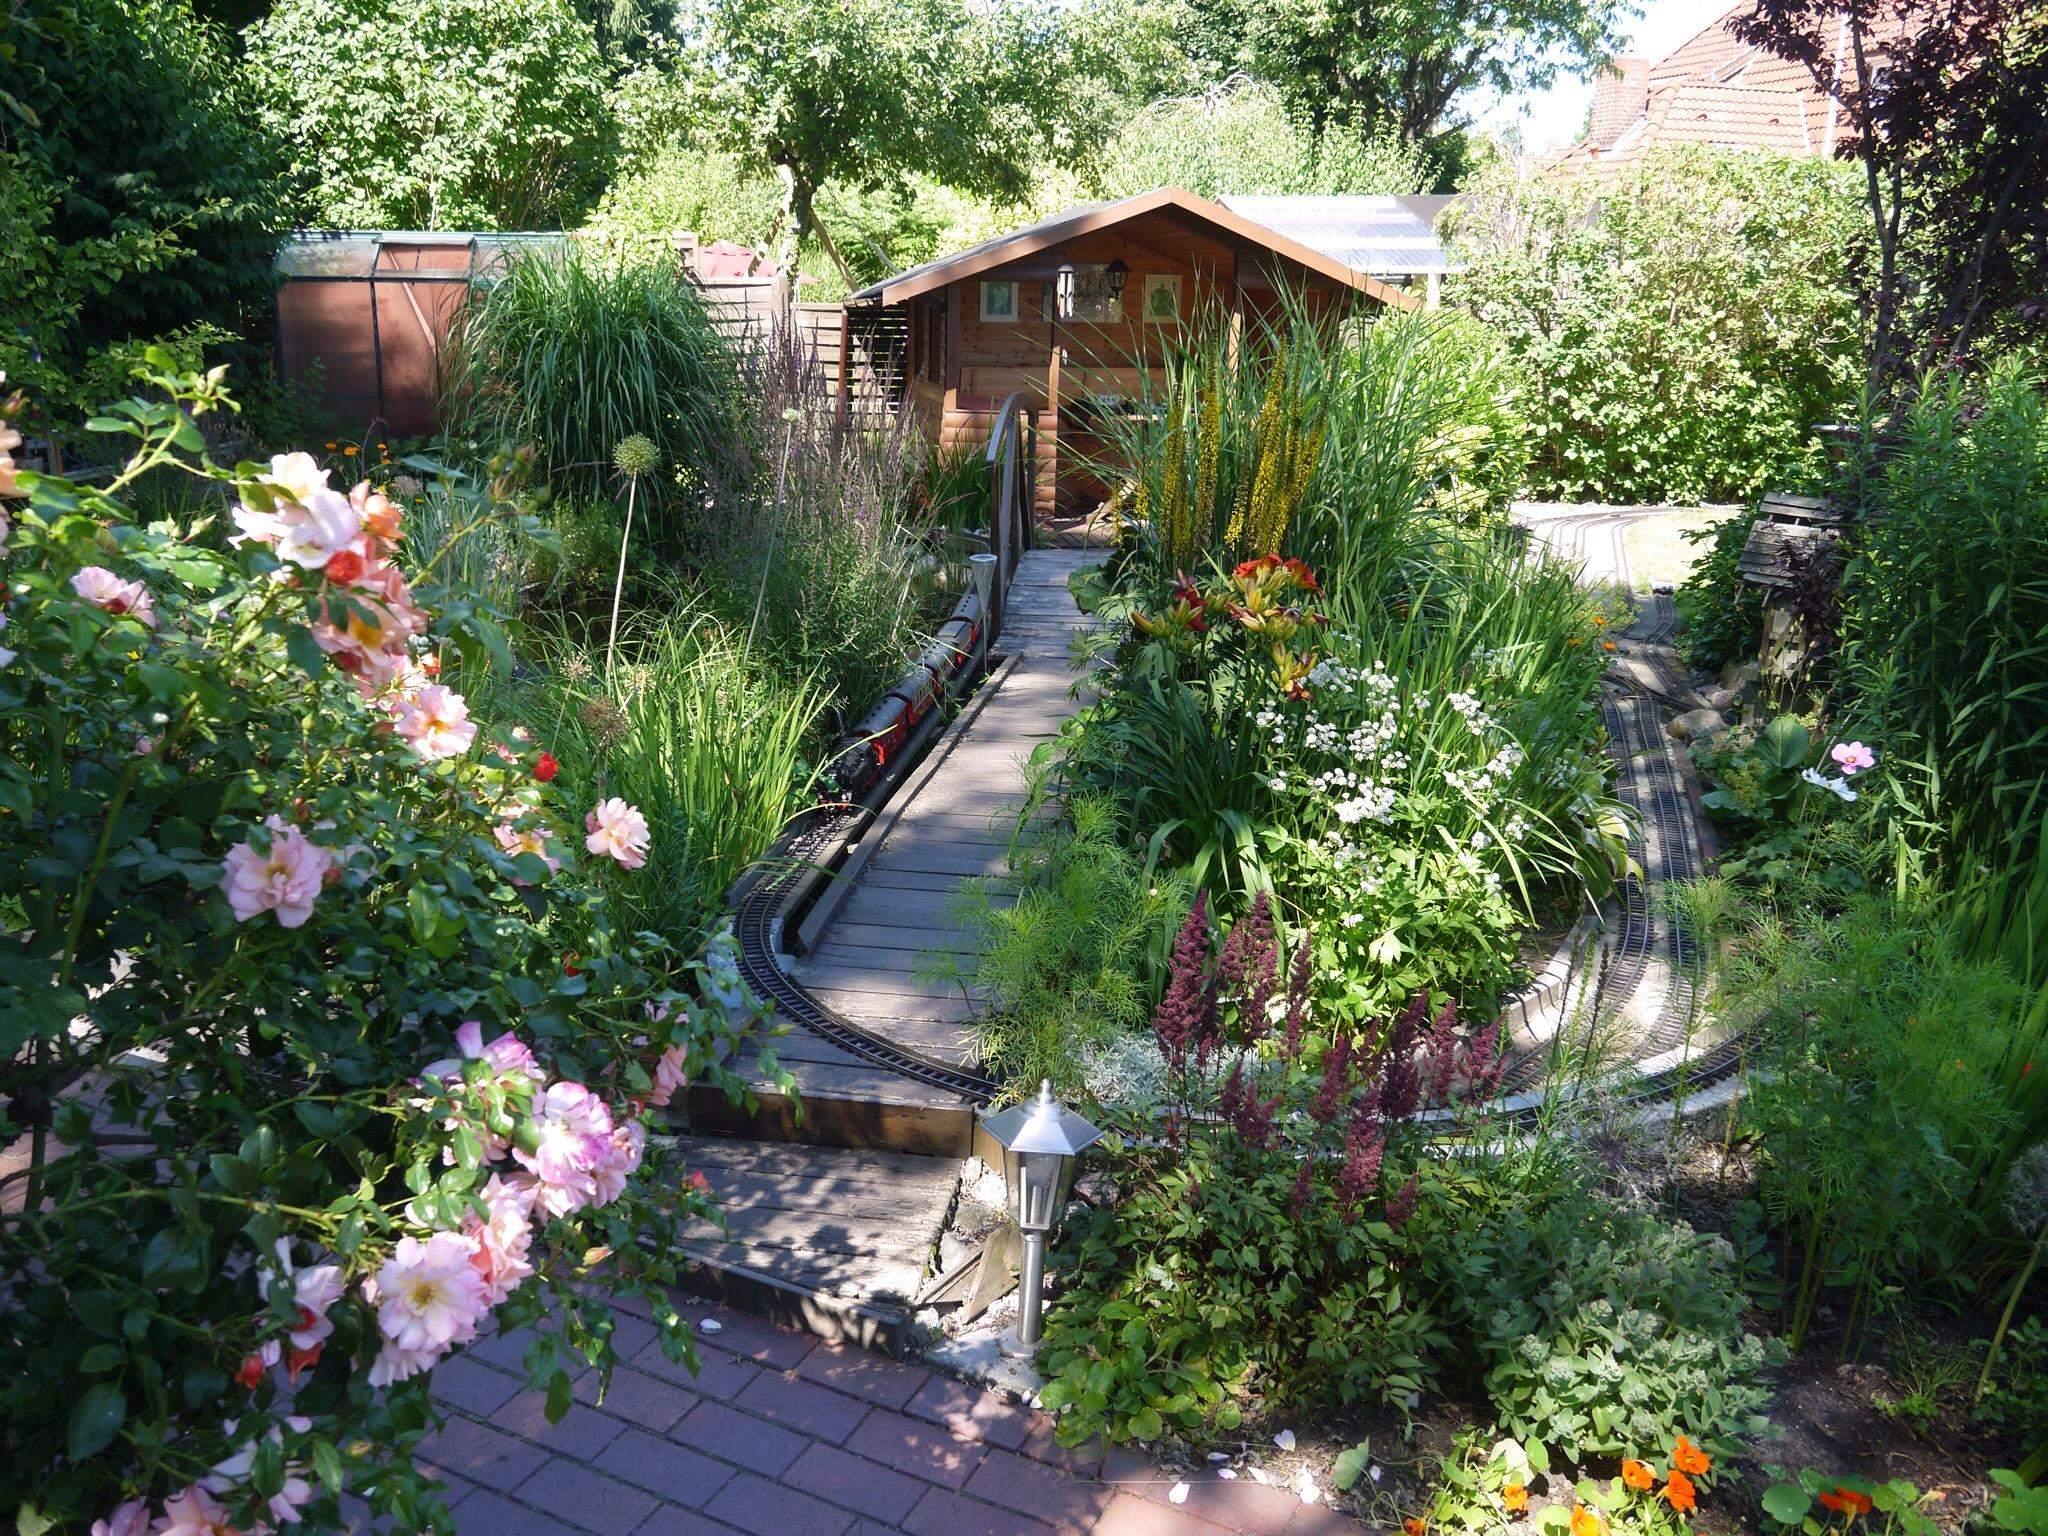 gruenergarten gartendeko gartenhaus gartenaufbewahrung sitzeckegarten diygartendeko 1367b9e8 80e6 4b05 acef 975d e6e strip=all